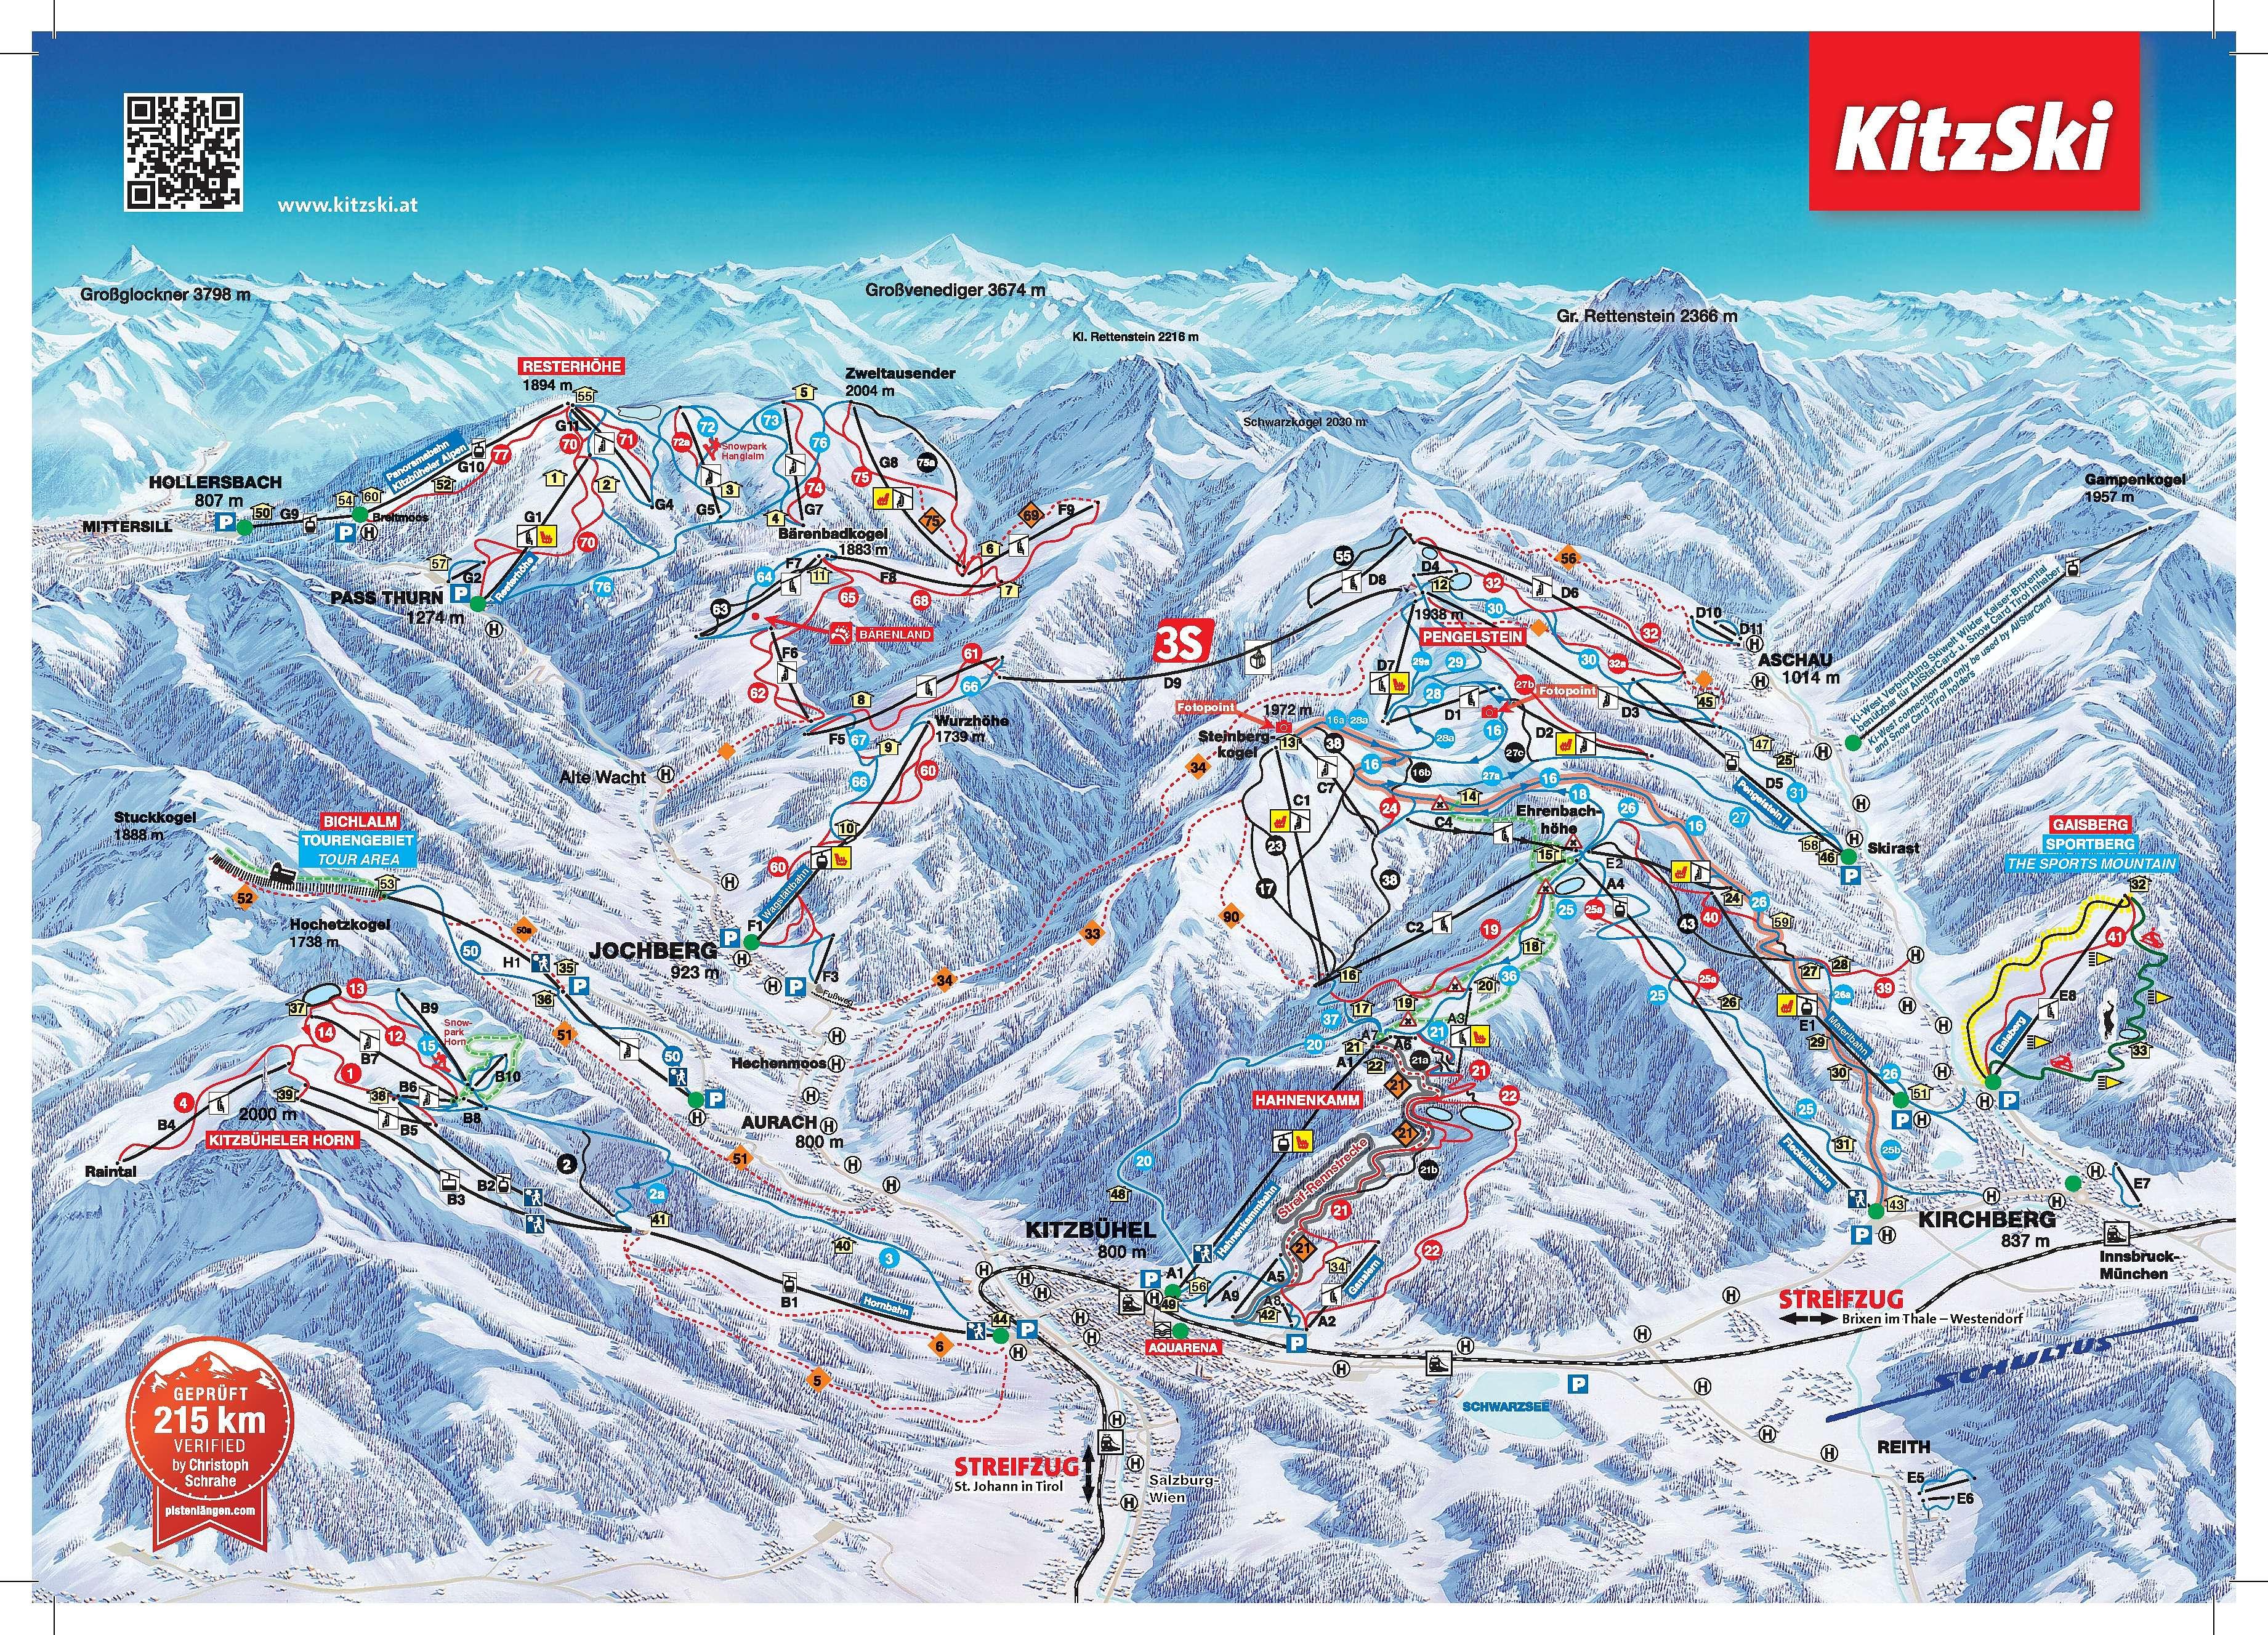 Kitzbuhel_map.jpg